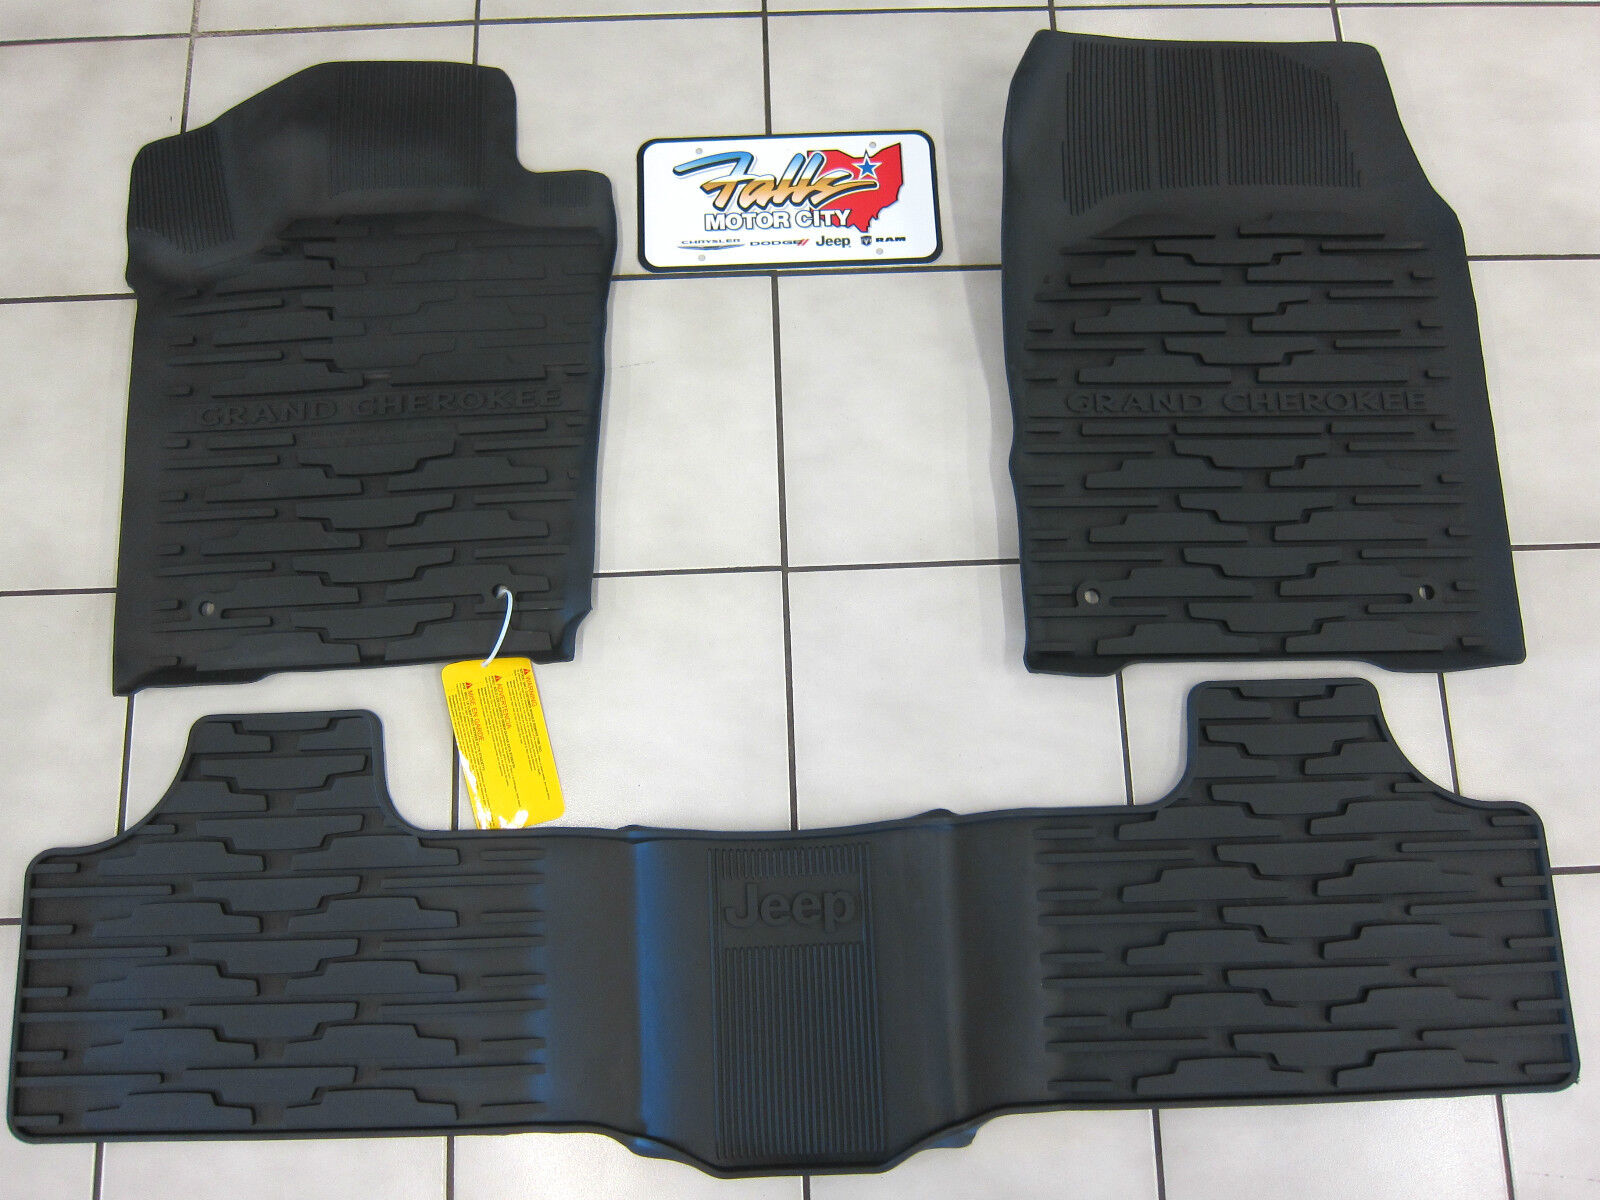 2013 2015 jeep grand cherokee rubber slush mats floor mats front rear mopar 840984136285 ebay. Black Bedroom Furniture Sets. Home Design Ideas